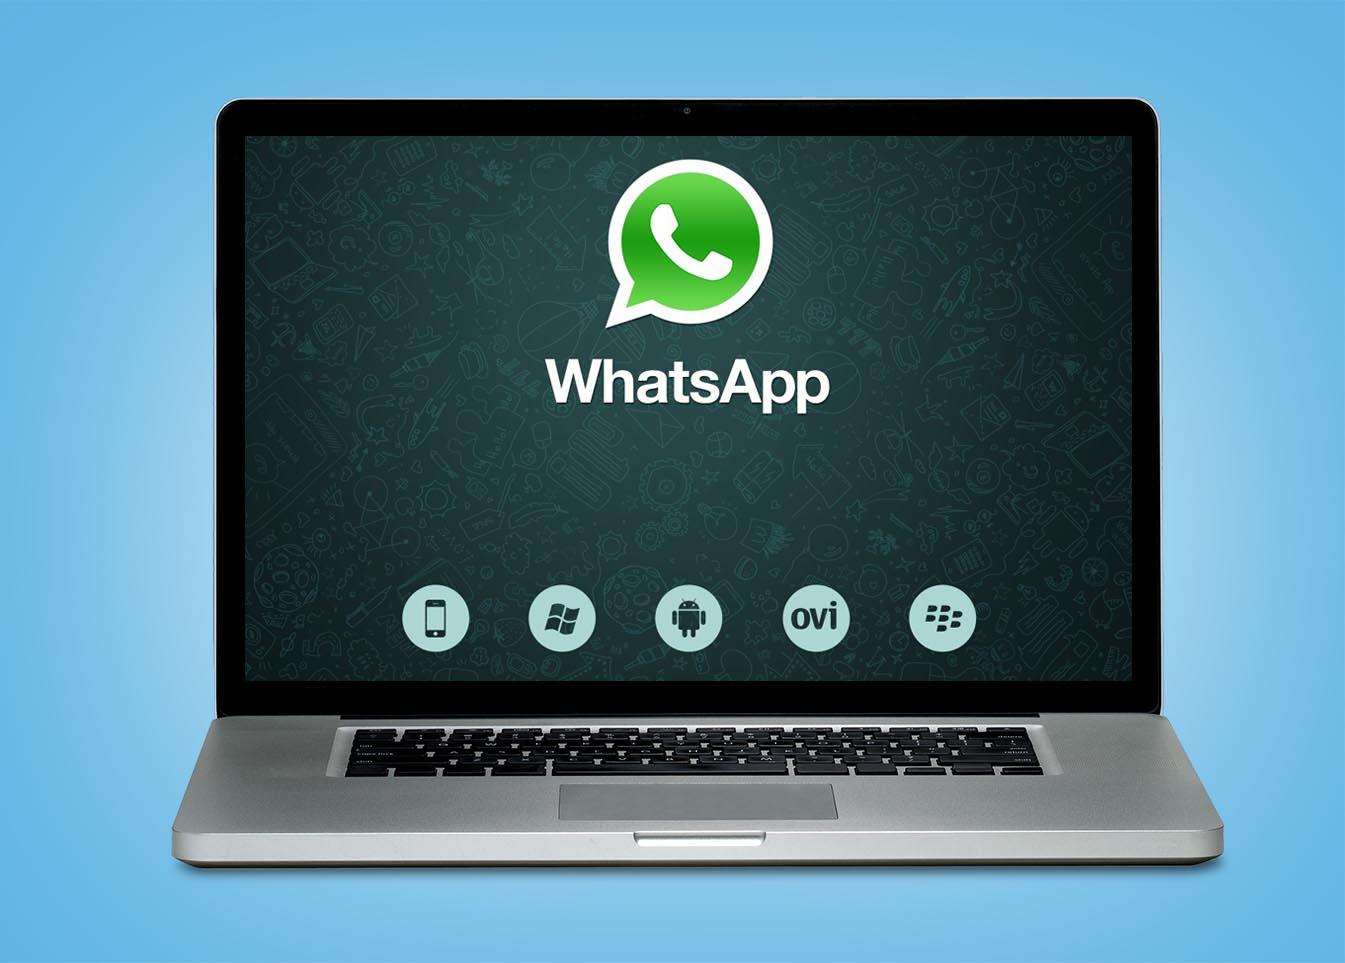 MacBook con WhatsApp